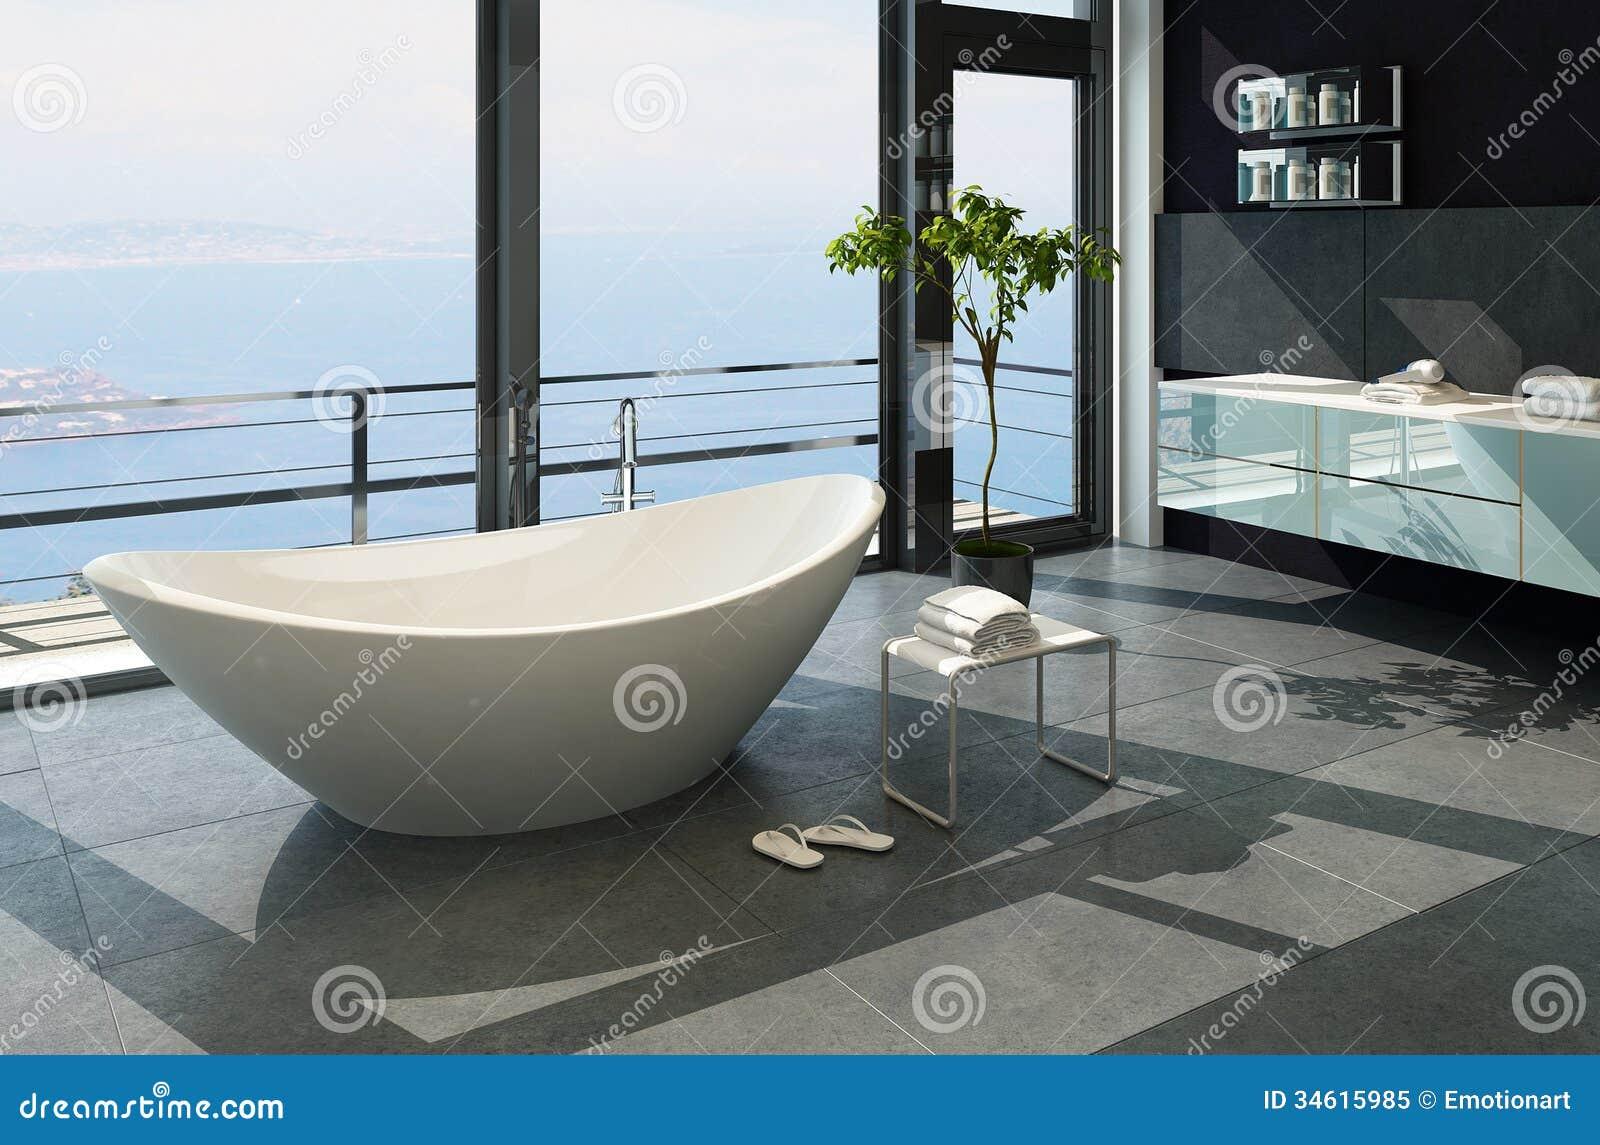 Ultramodern contemporary design bathroom interior with sea